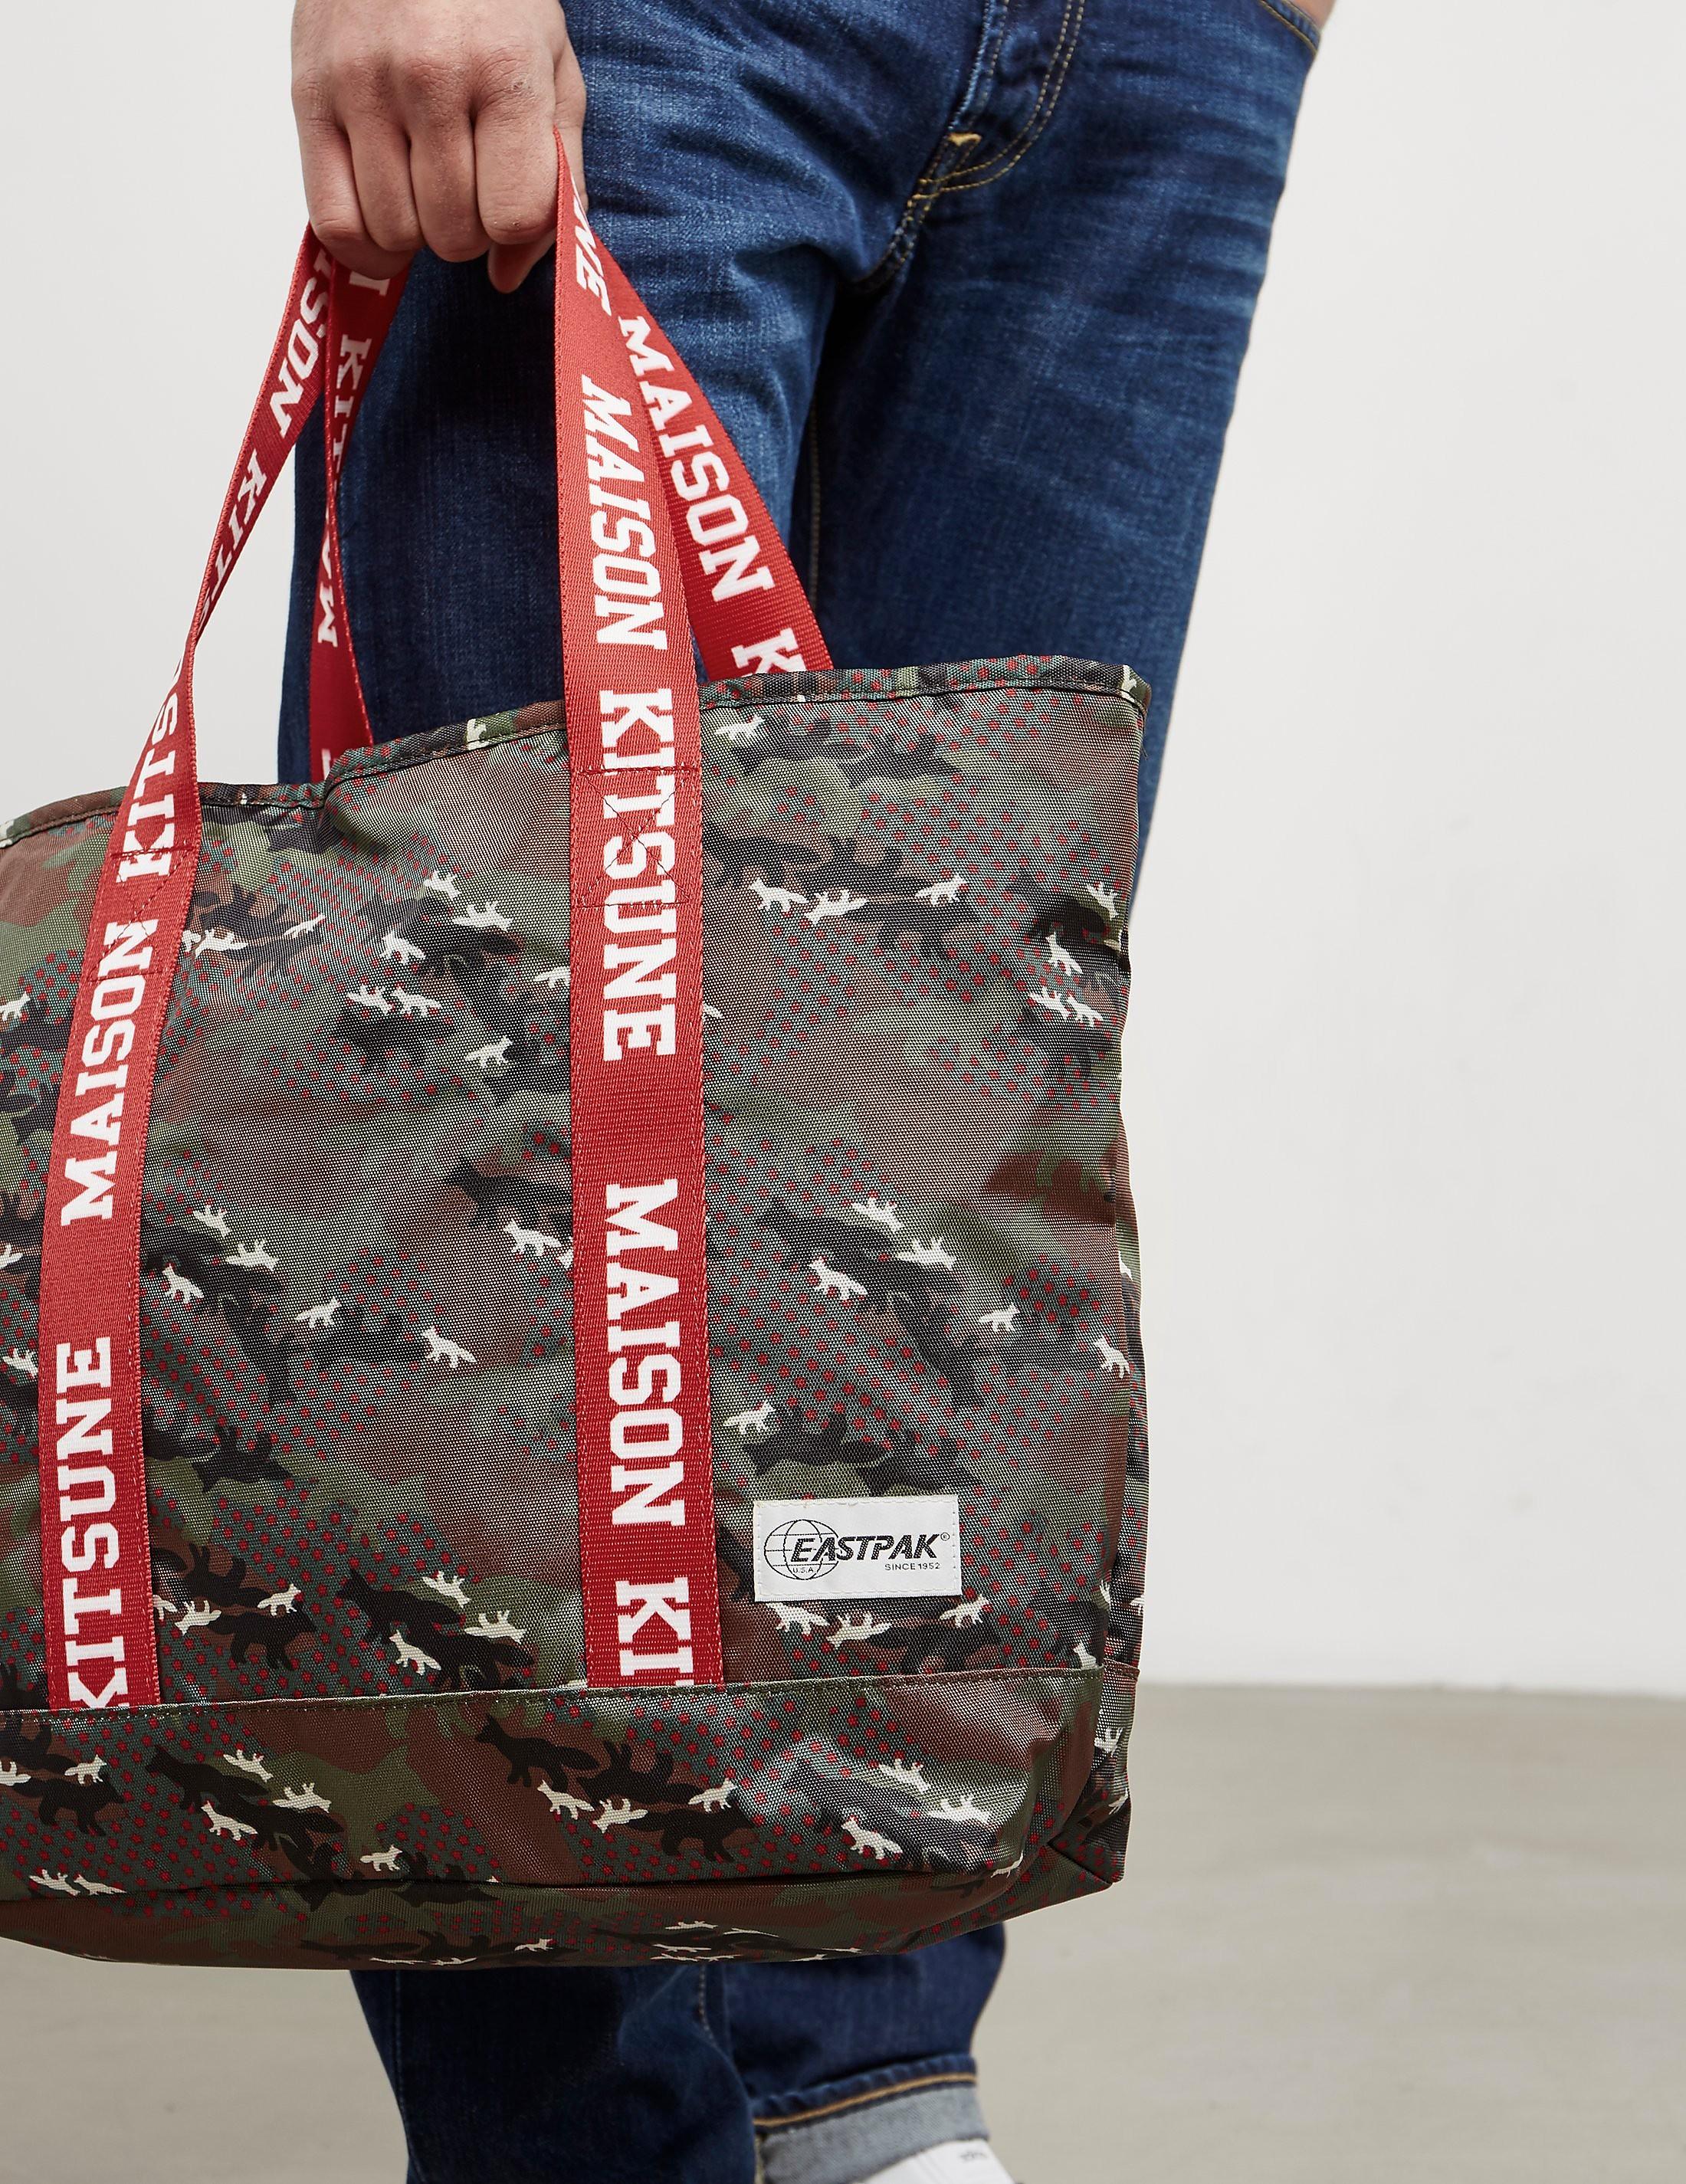 Maison Kitsune x Eastpak Camouflage Tote Bag